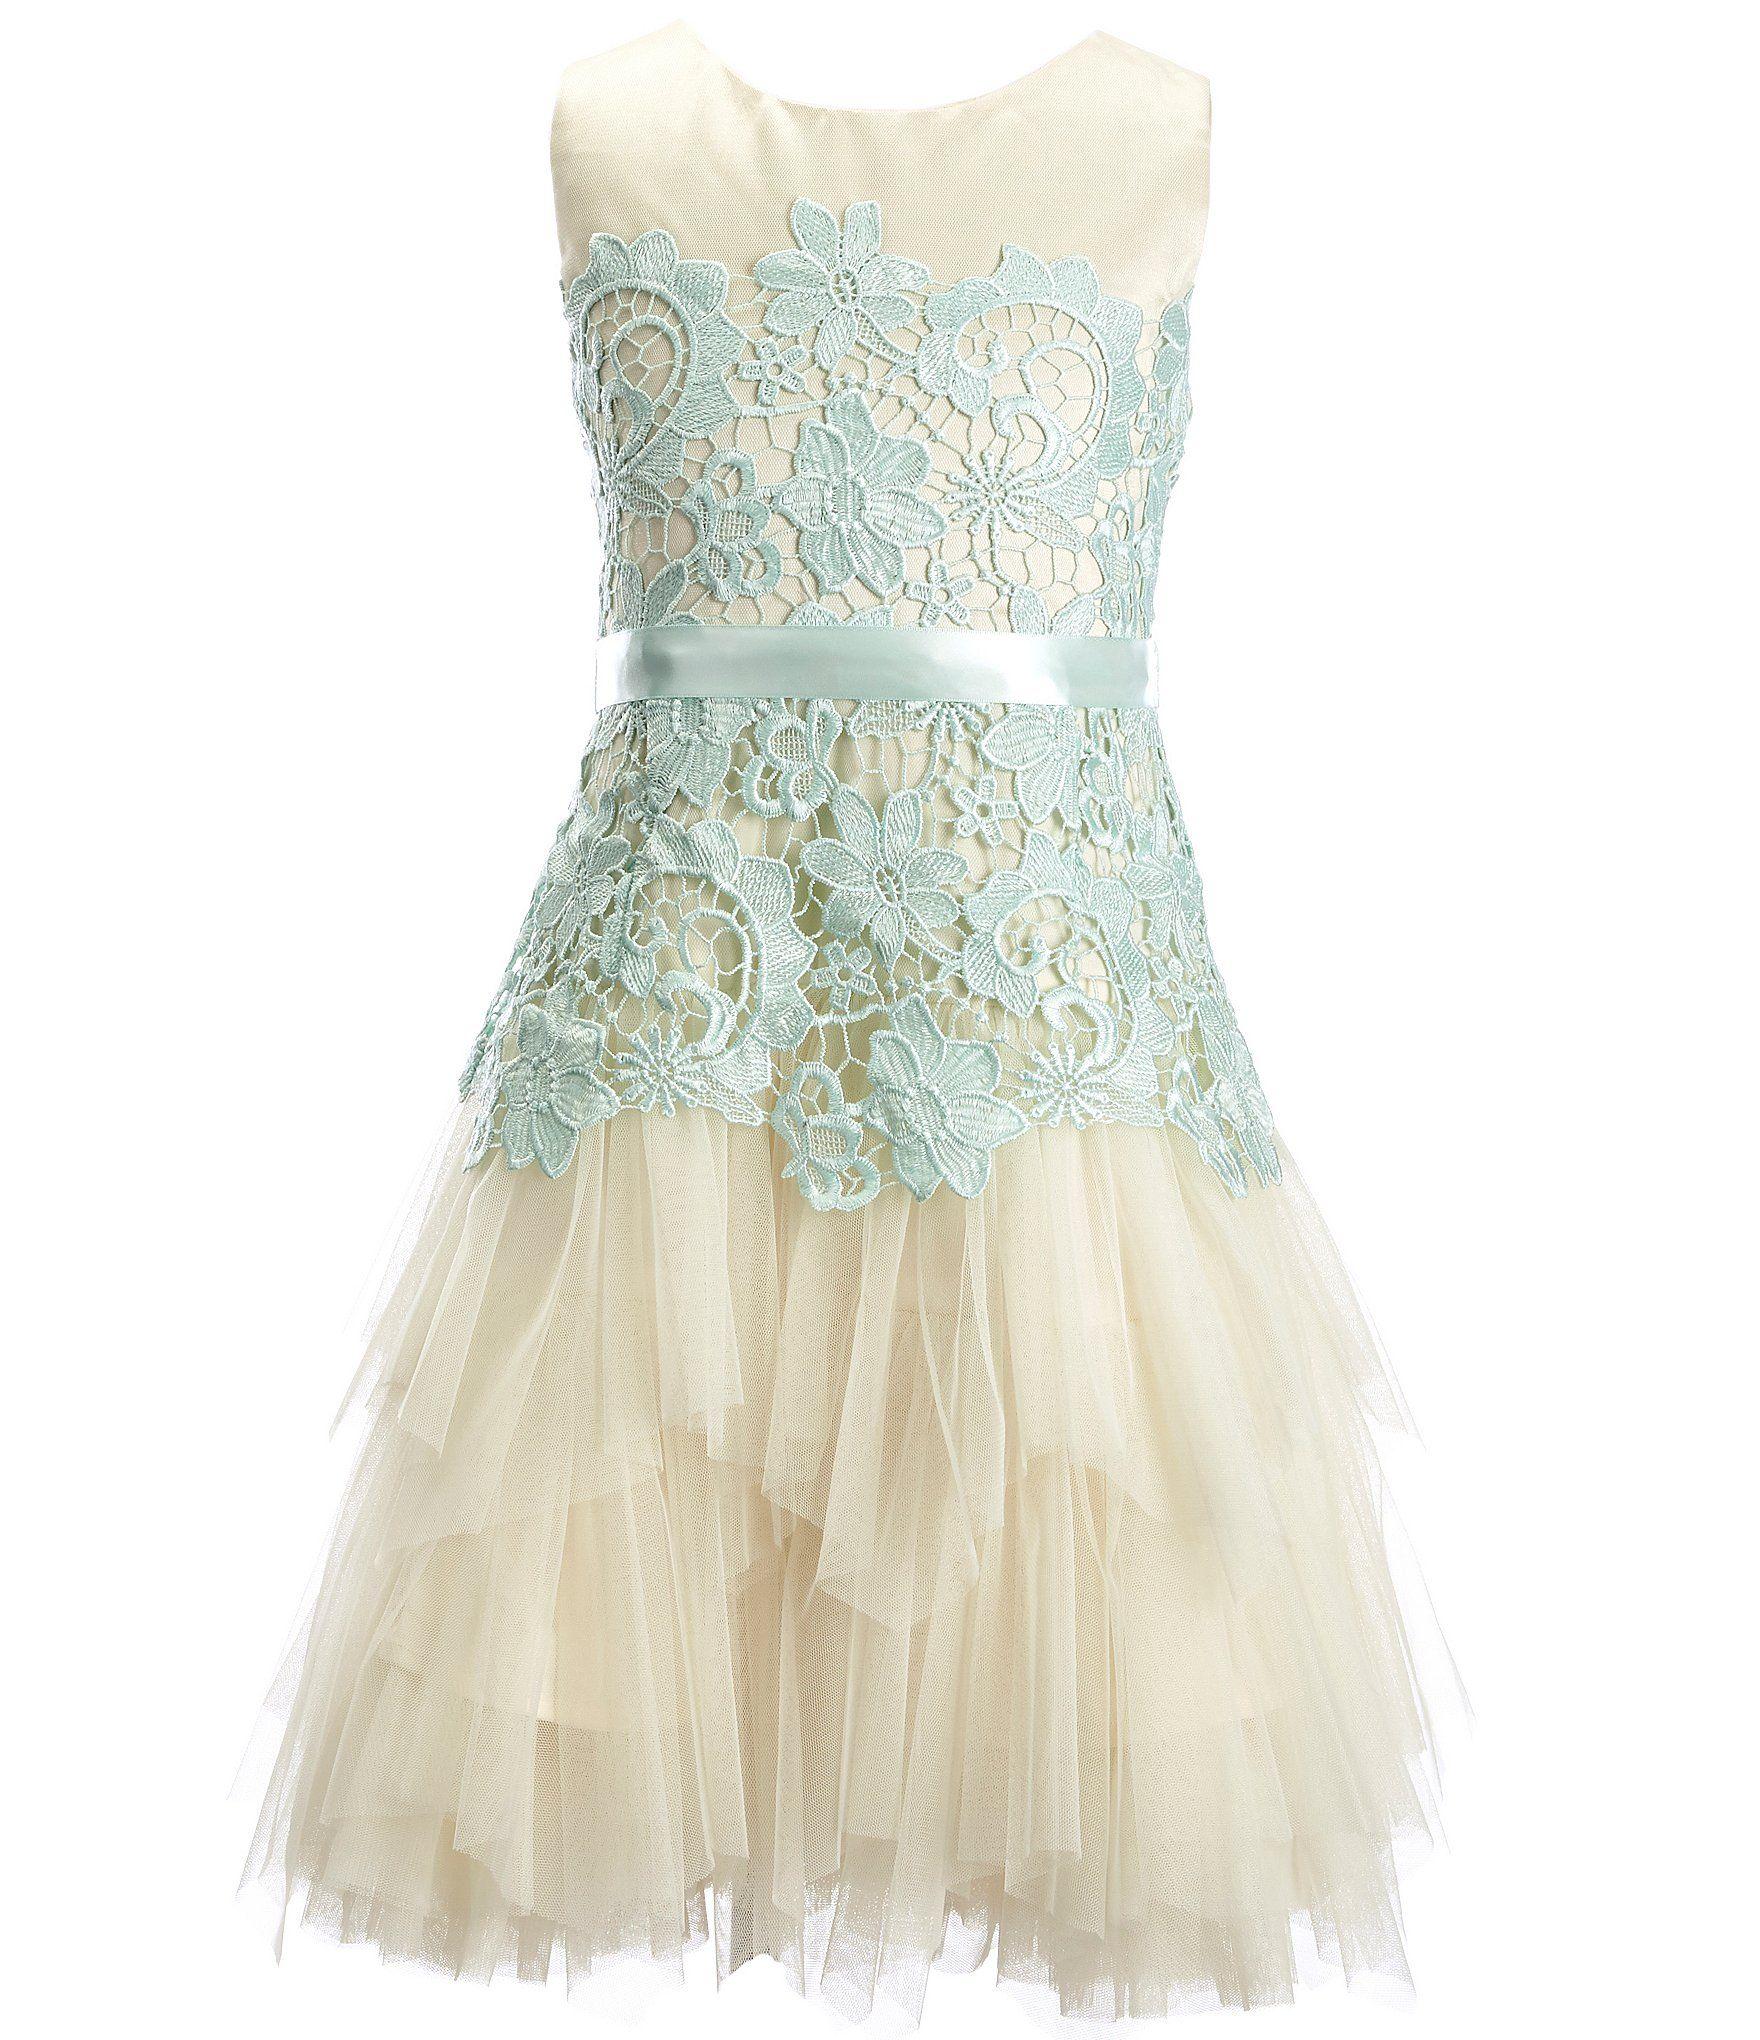 ba7669ba523e Shop for Chantilly Place Big Girls 7-16 Lace Cascade Tiered Dress at ...